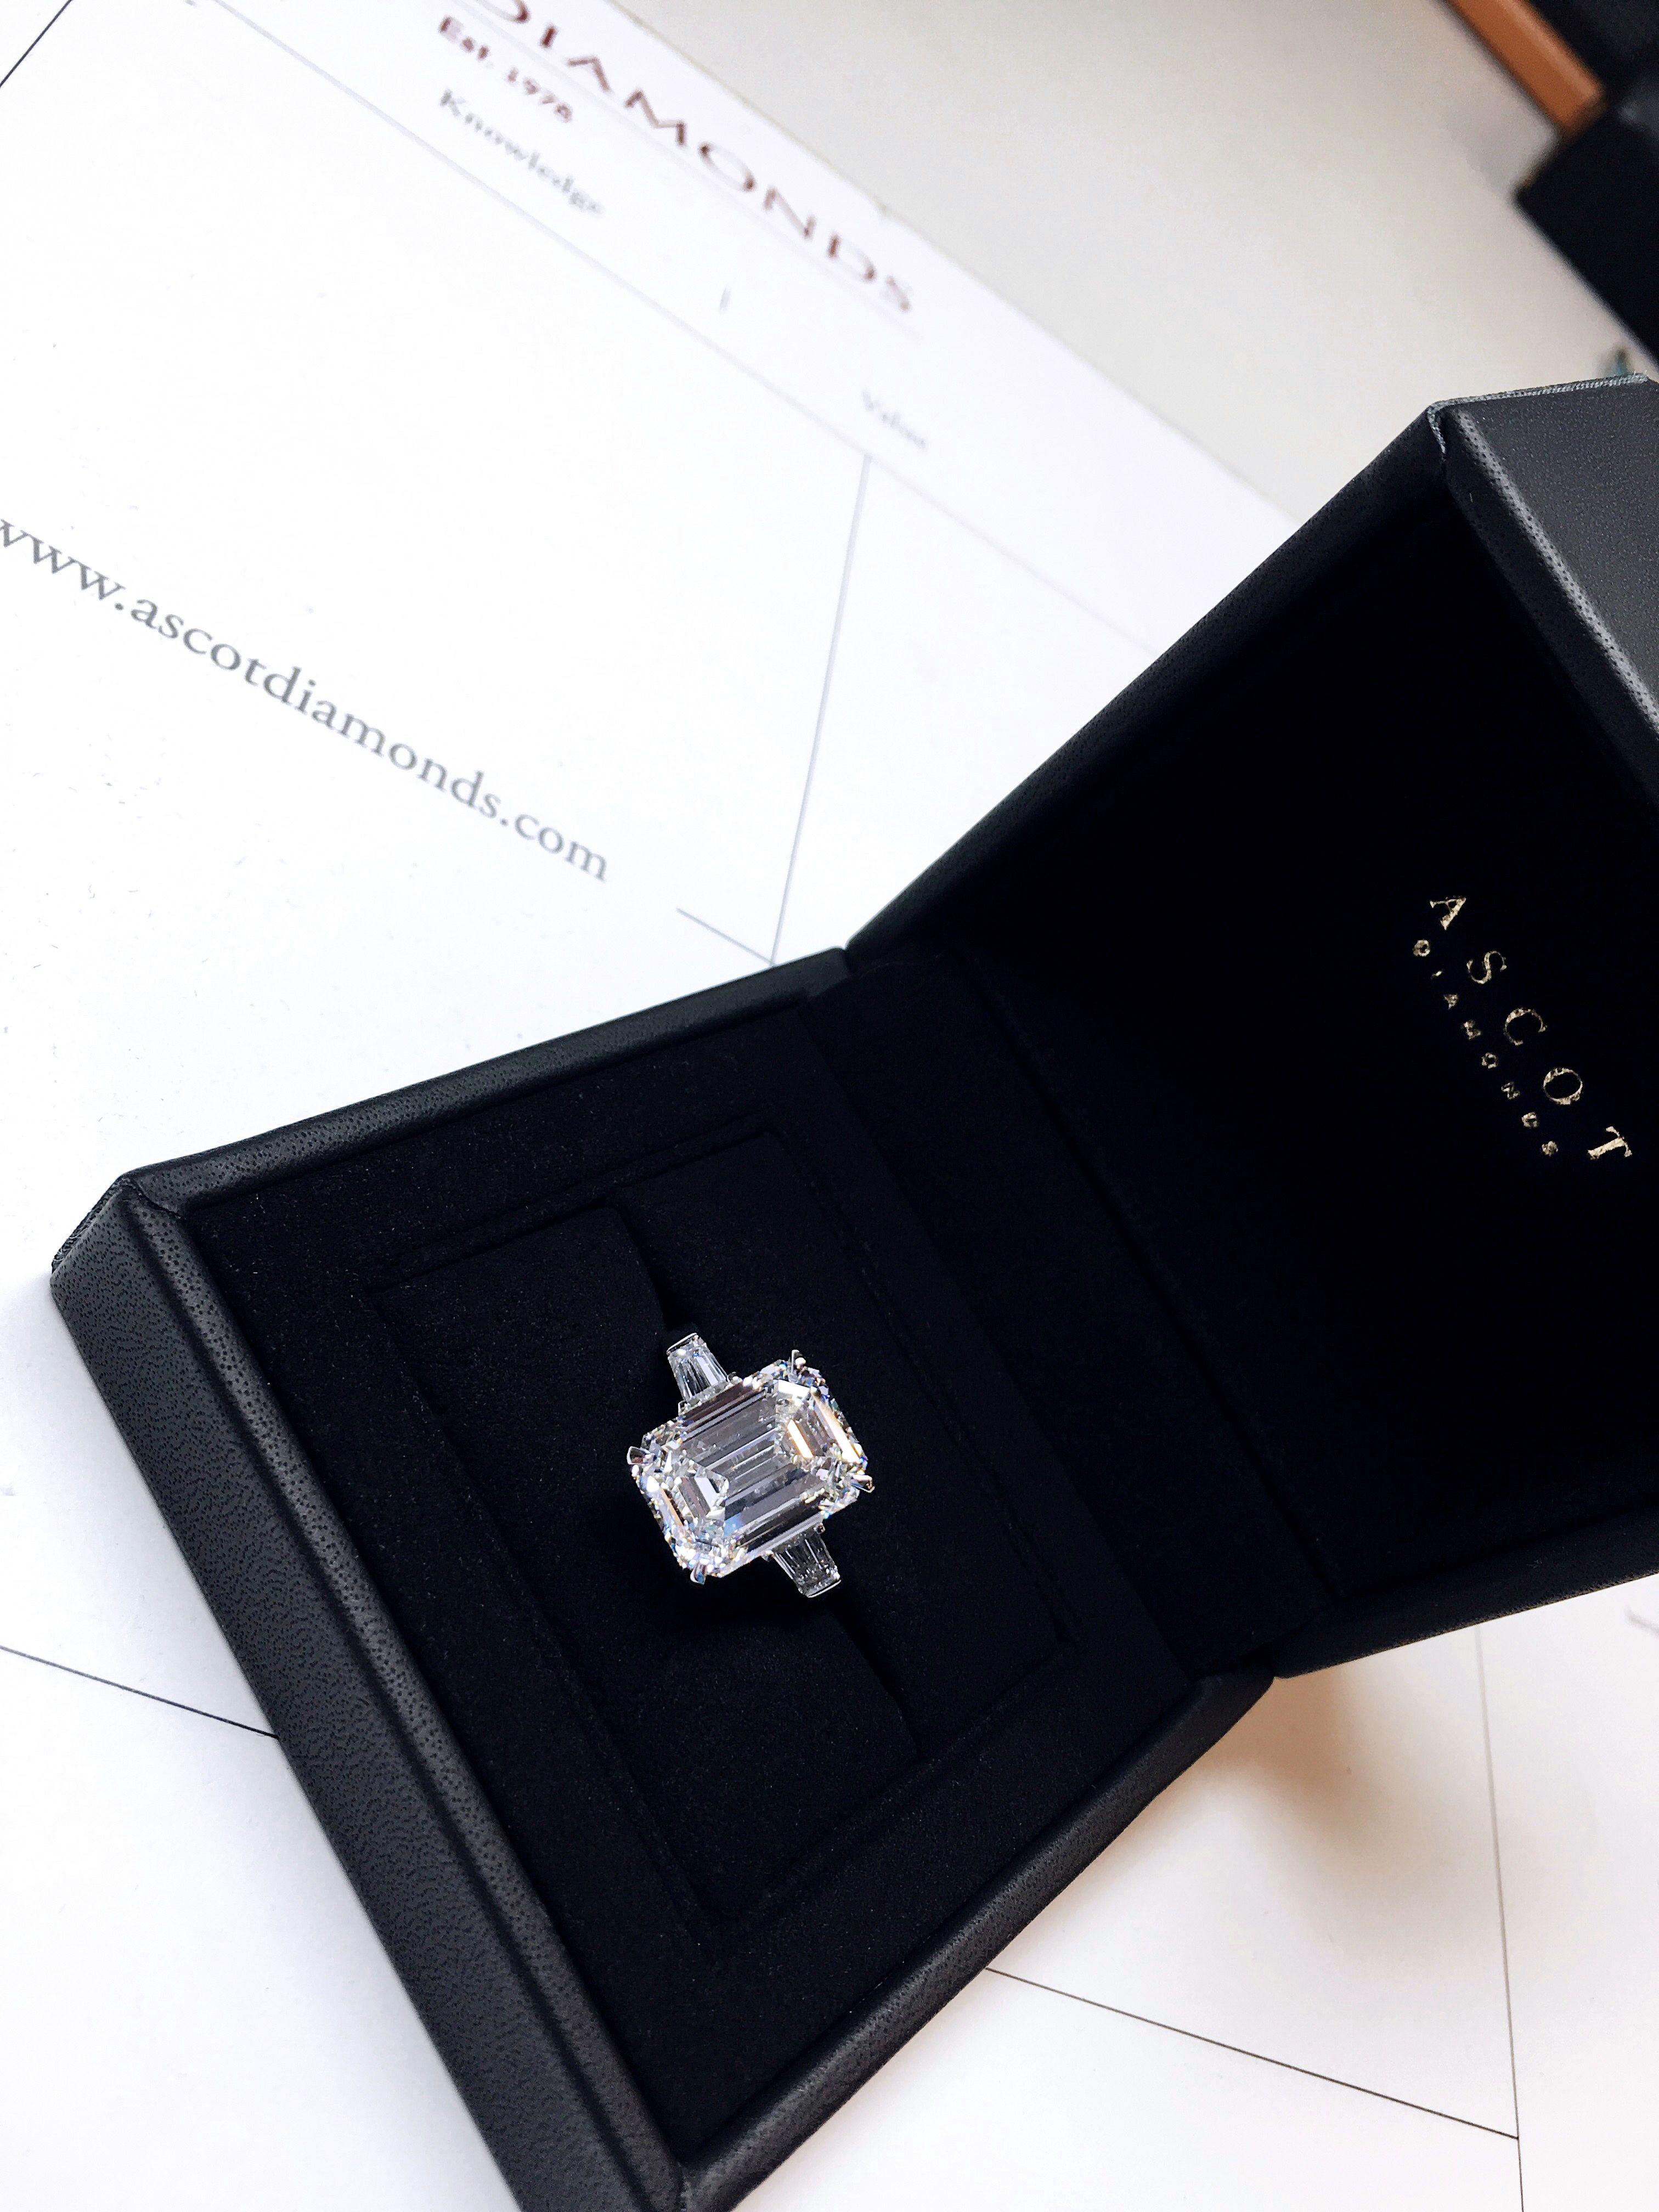 Pin on Ascot Diamonds Engagement Rings